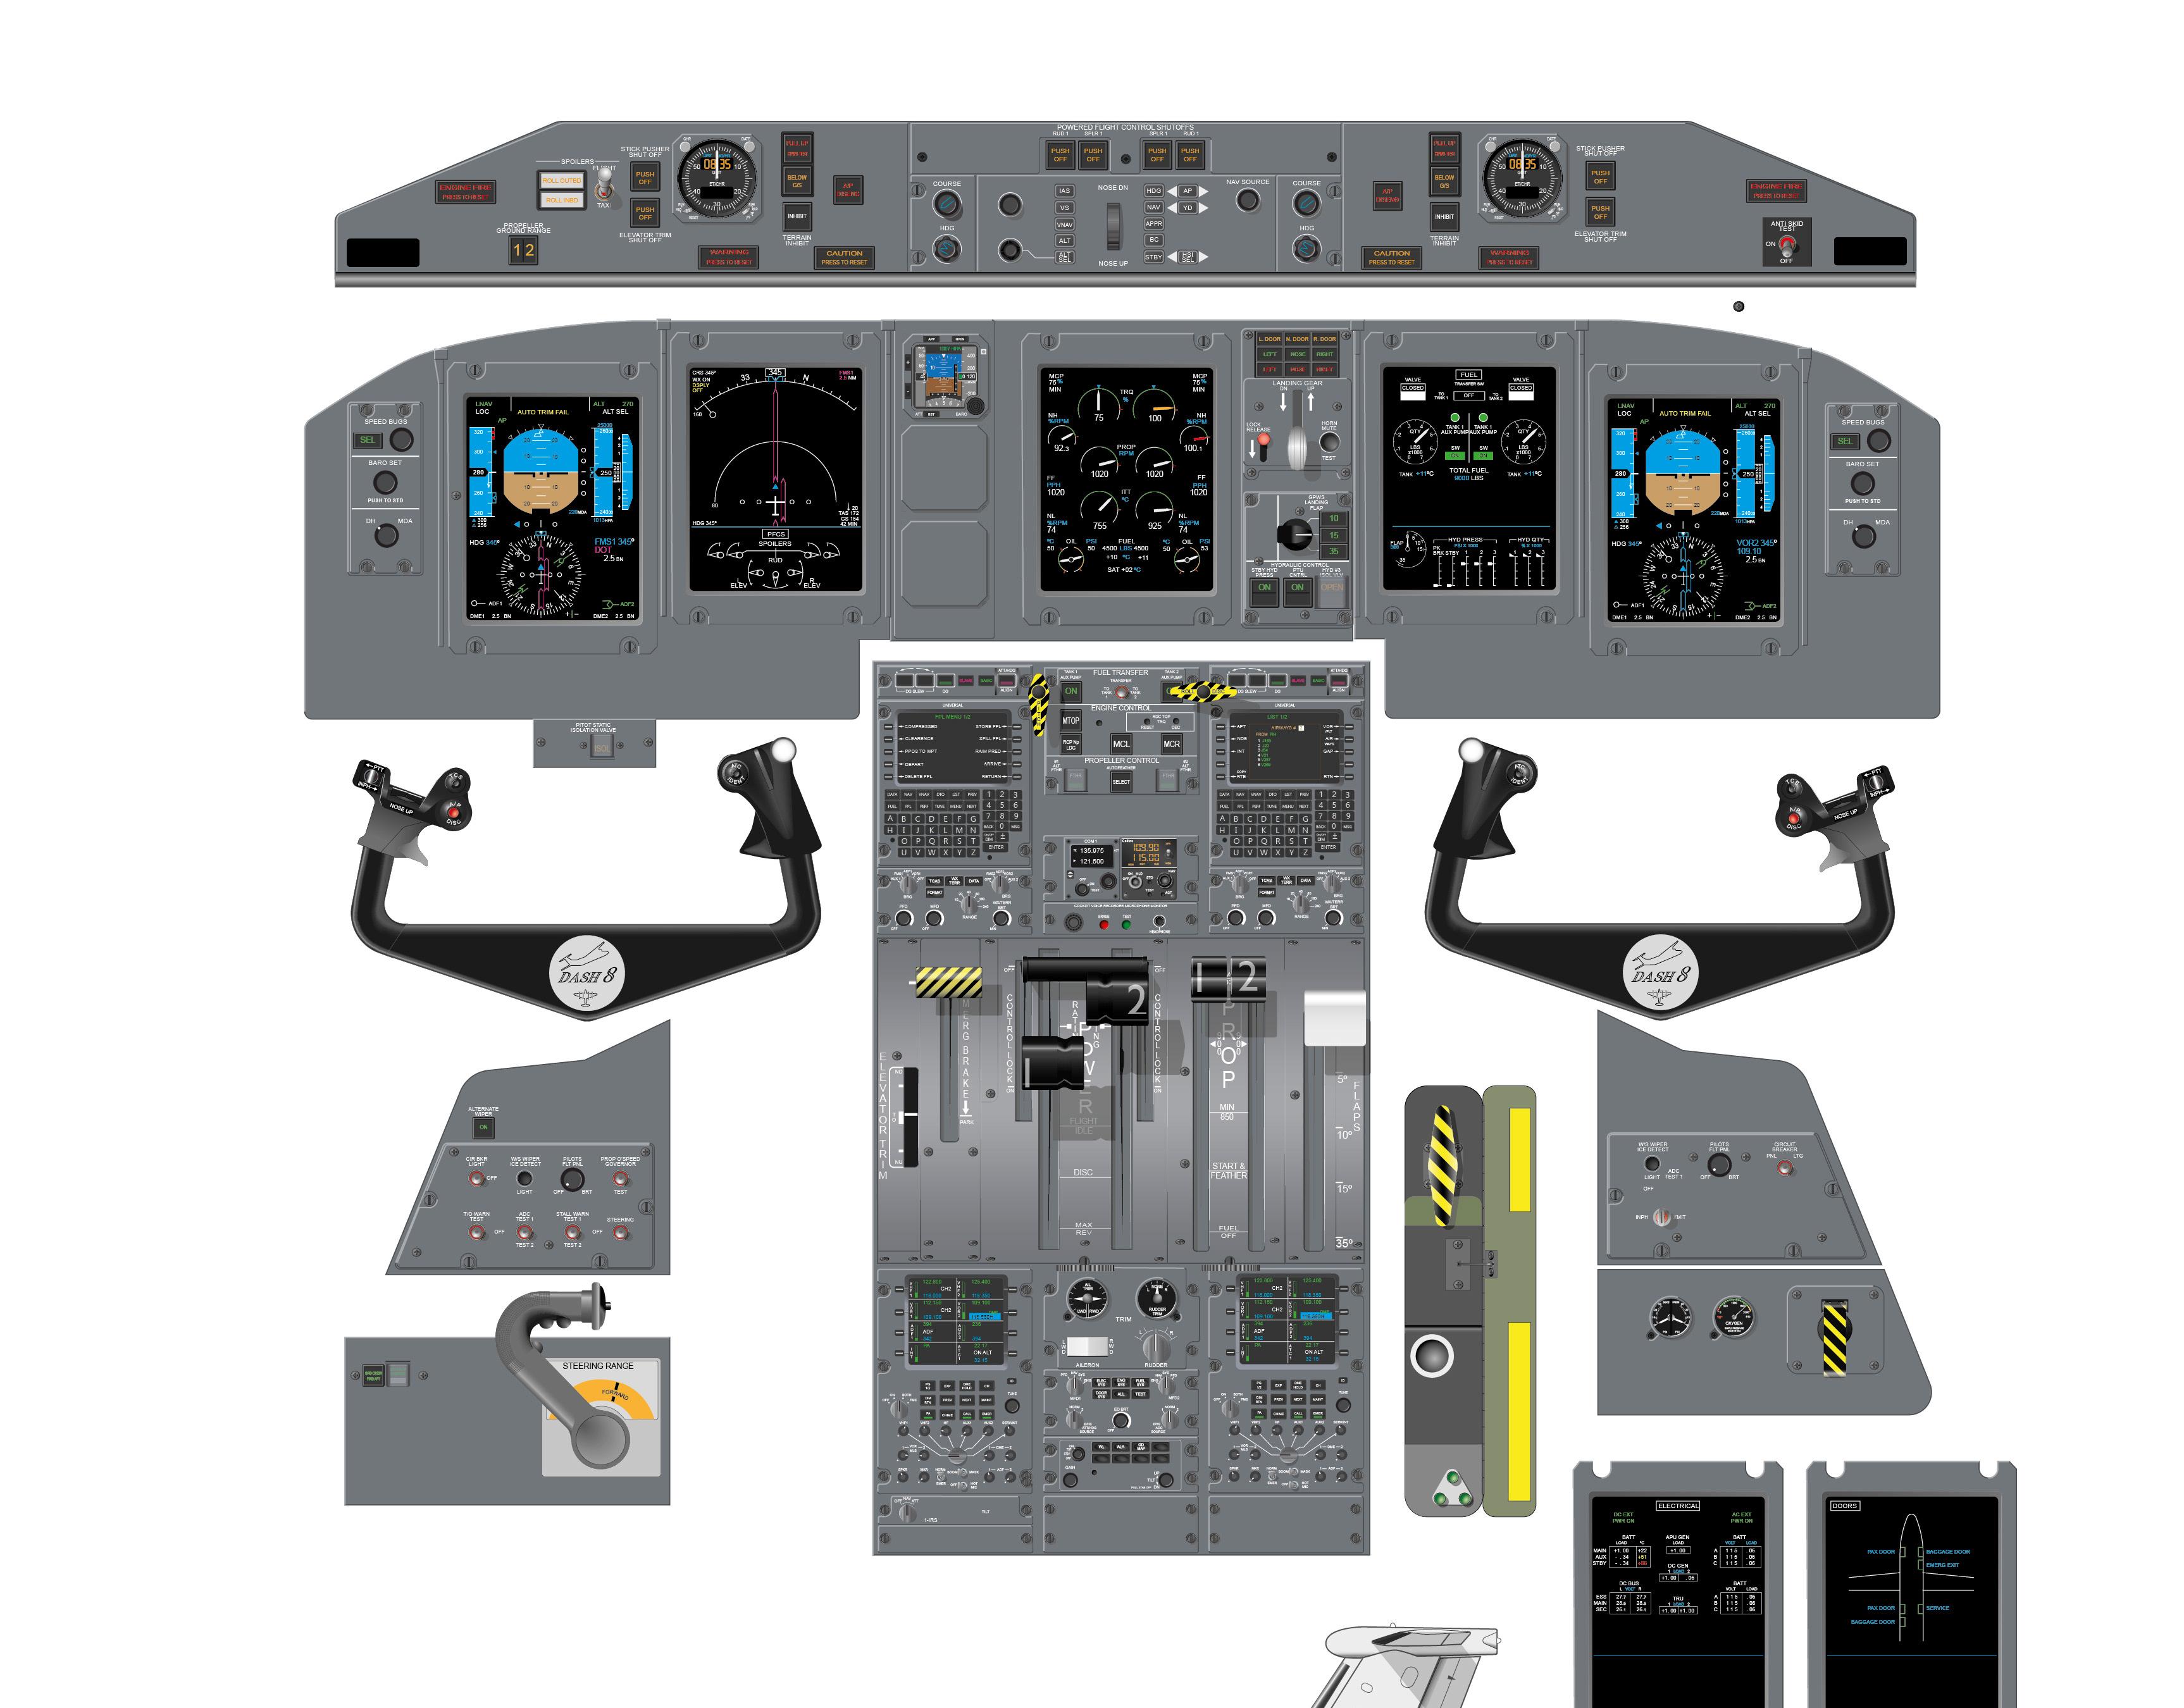 Glyn Chadwick - Bombardier Q400 cockpit poster